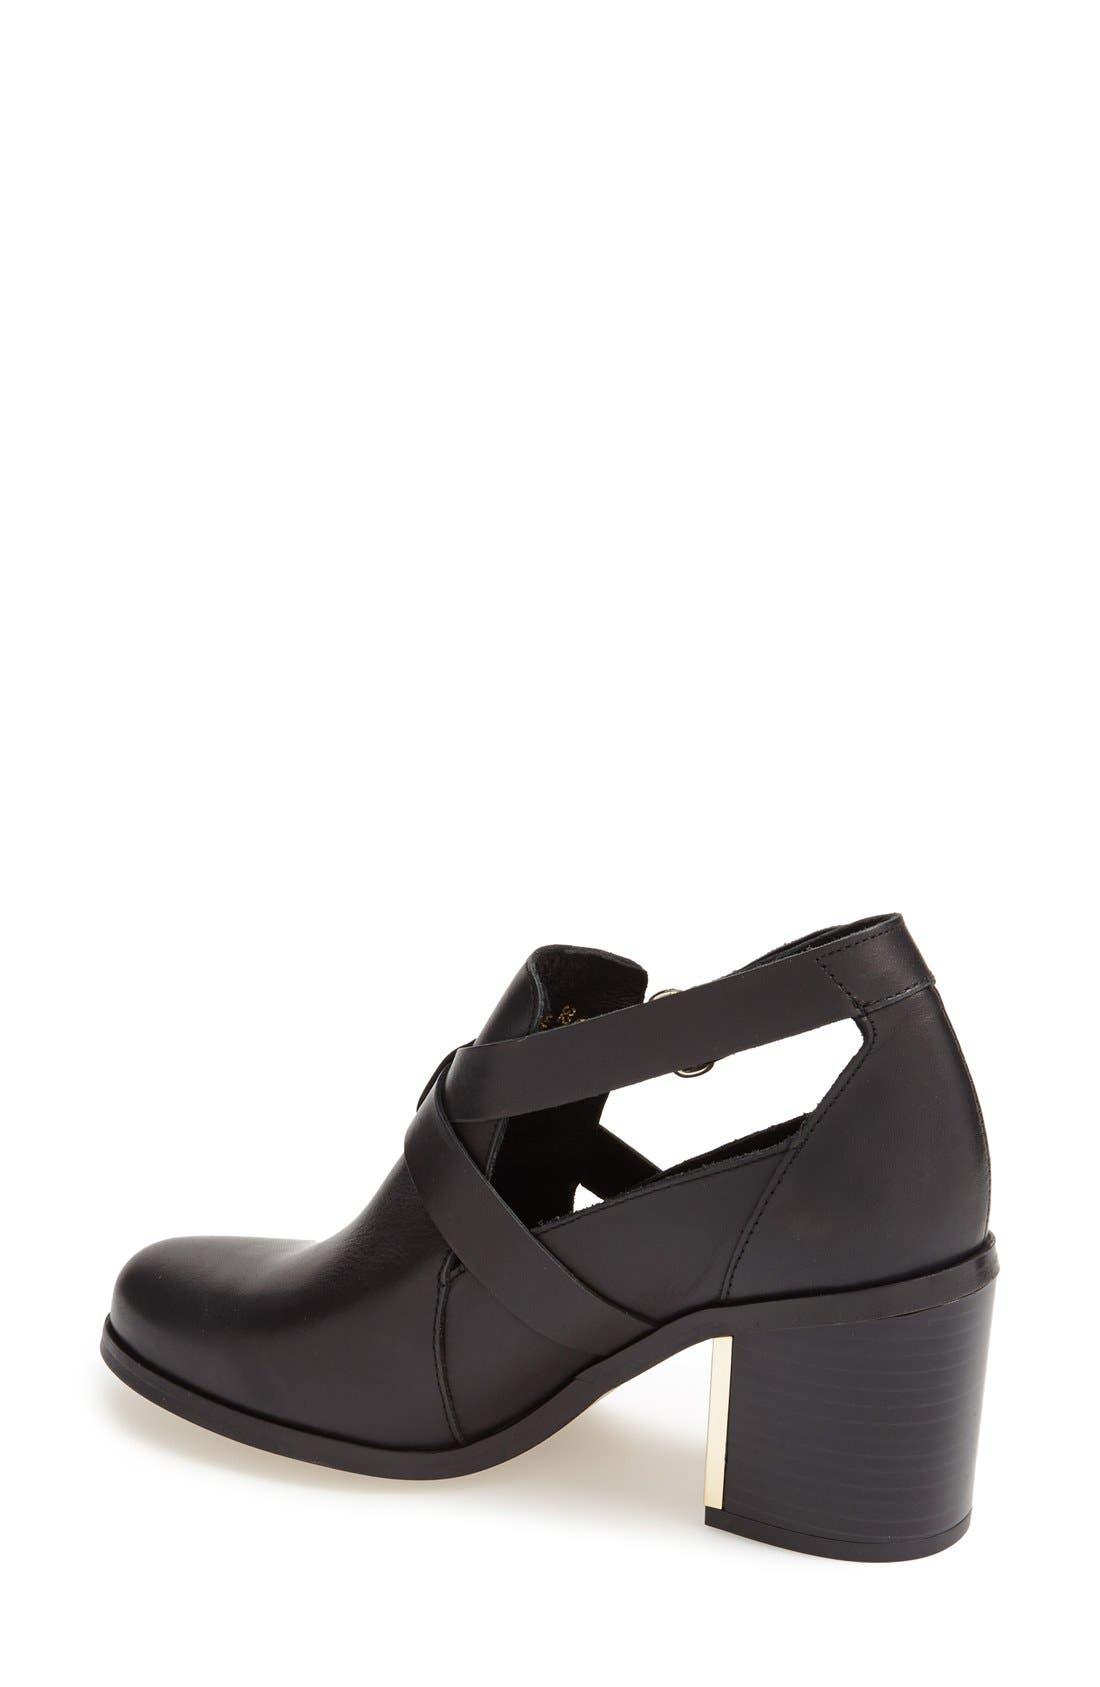 Alternate Image 2  - Topshop 'Mirror' Crisscross Strap Leather Ankle Boot (Women)